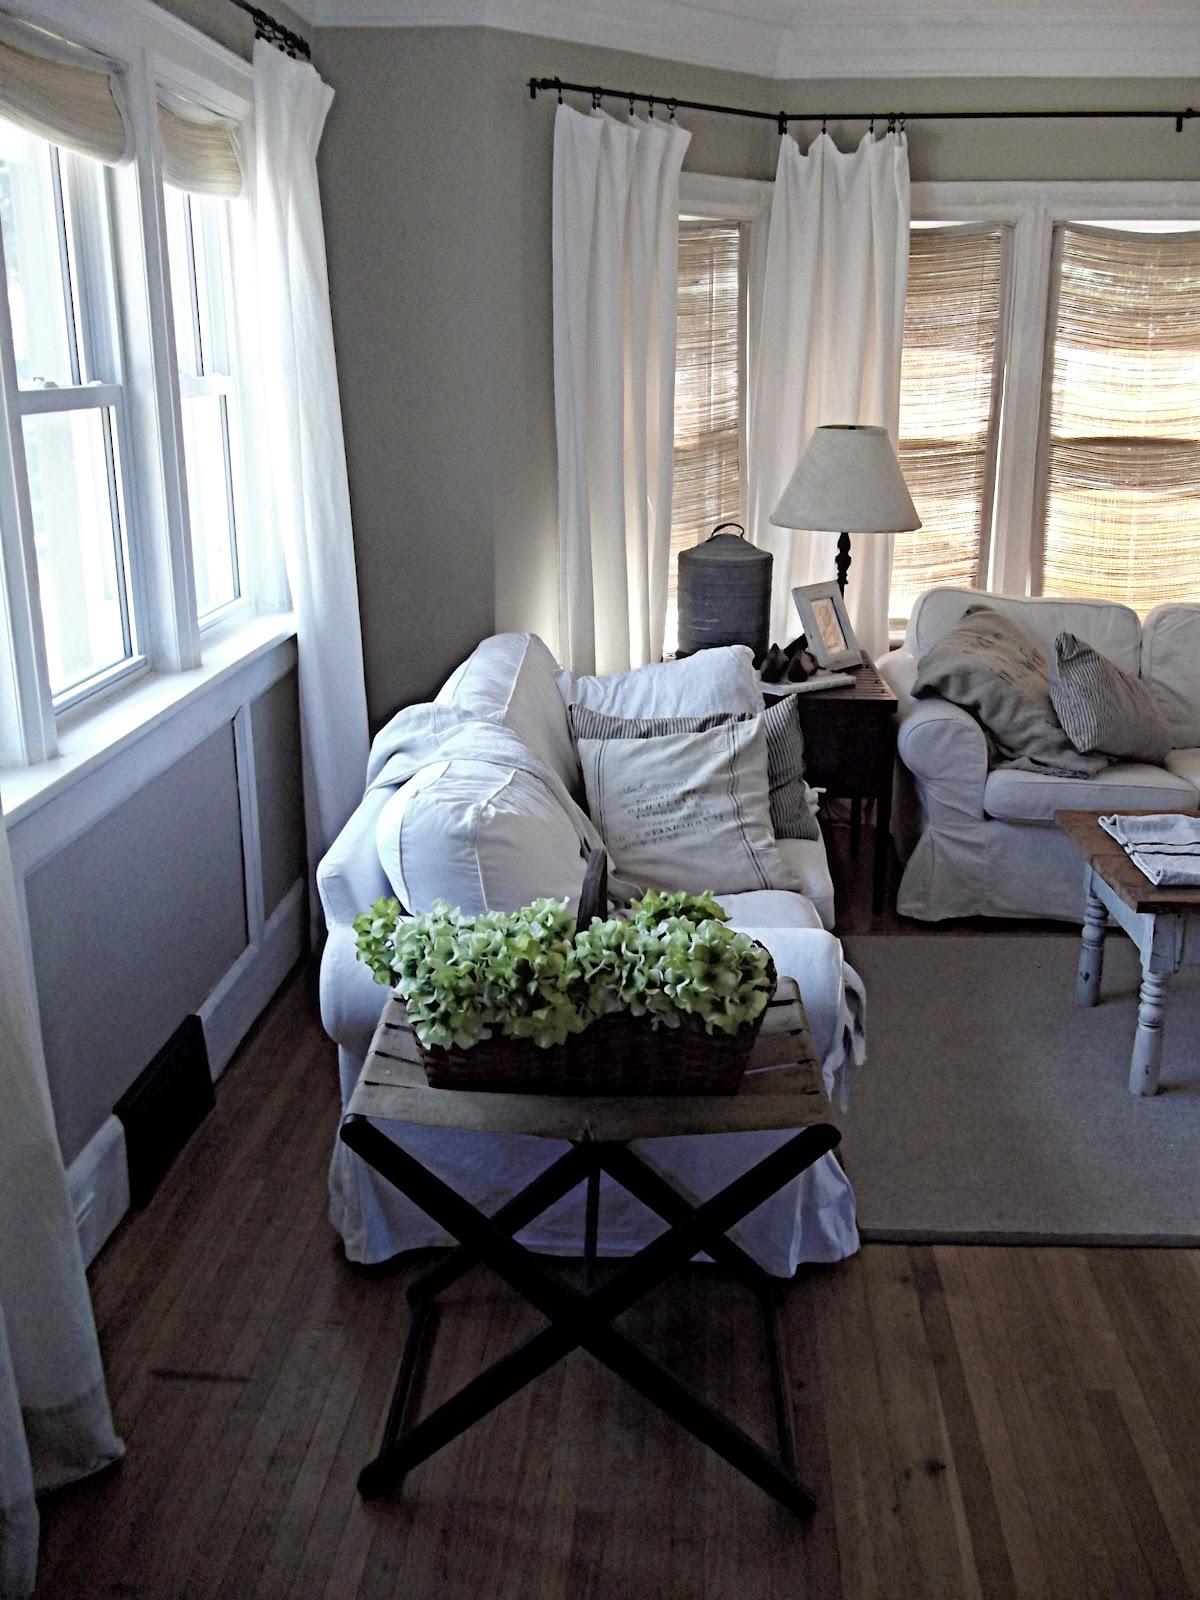 Rustic Farmhouse: Comforts of Home on Farmhouse Living Room Curtain Ideas  id=70394